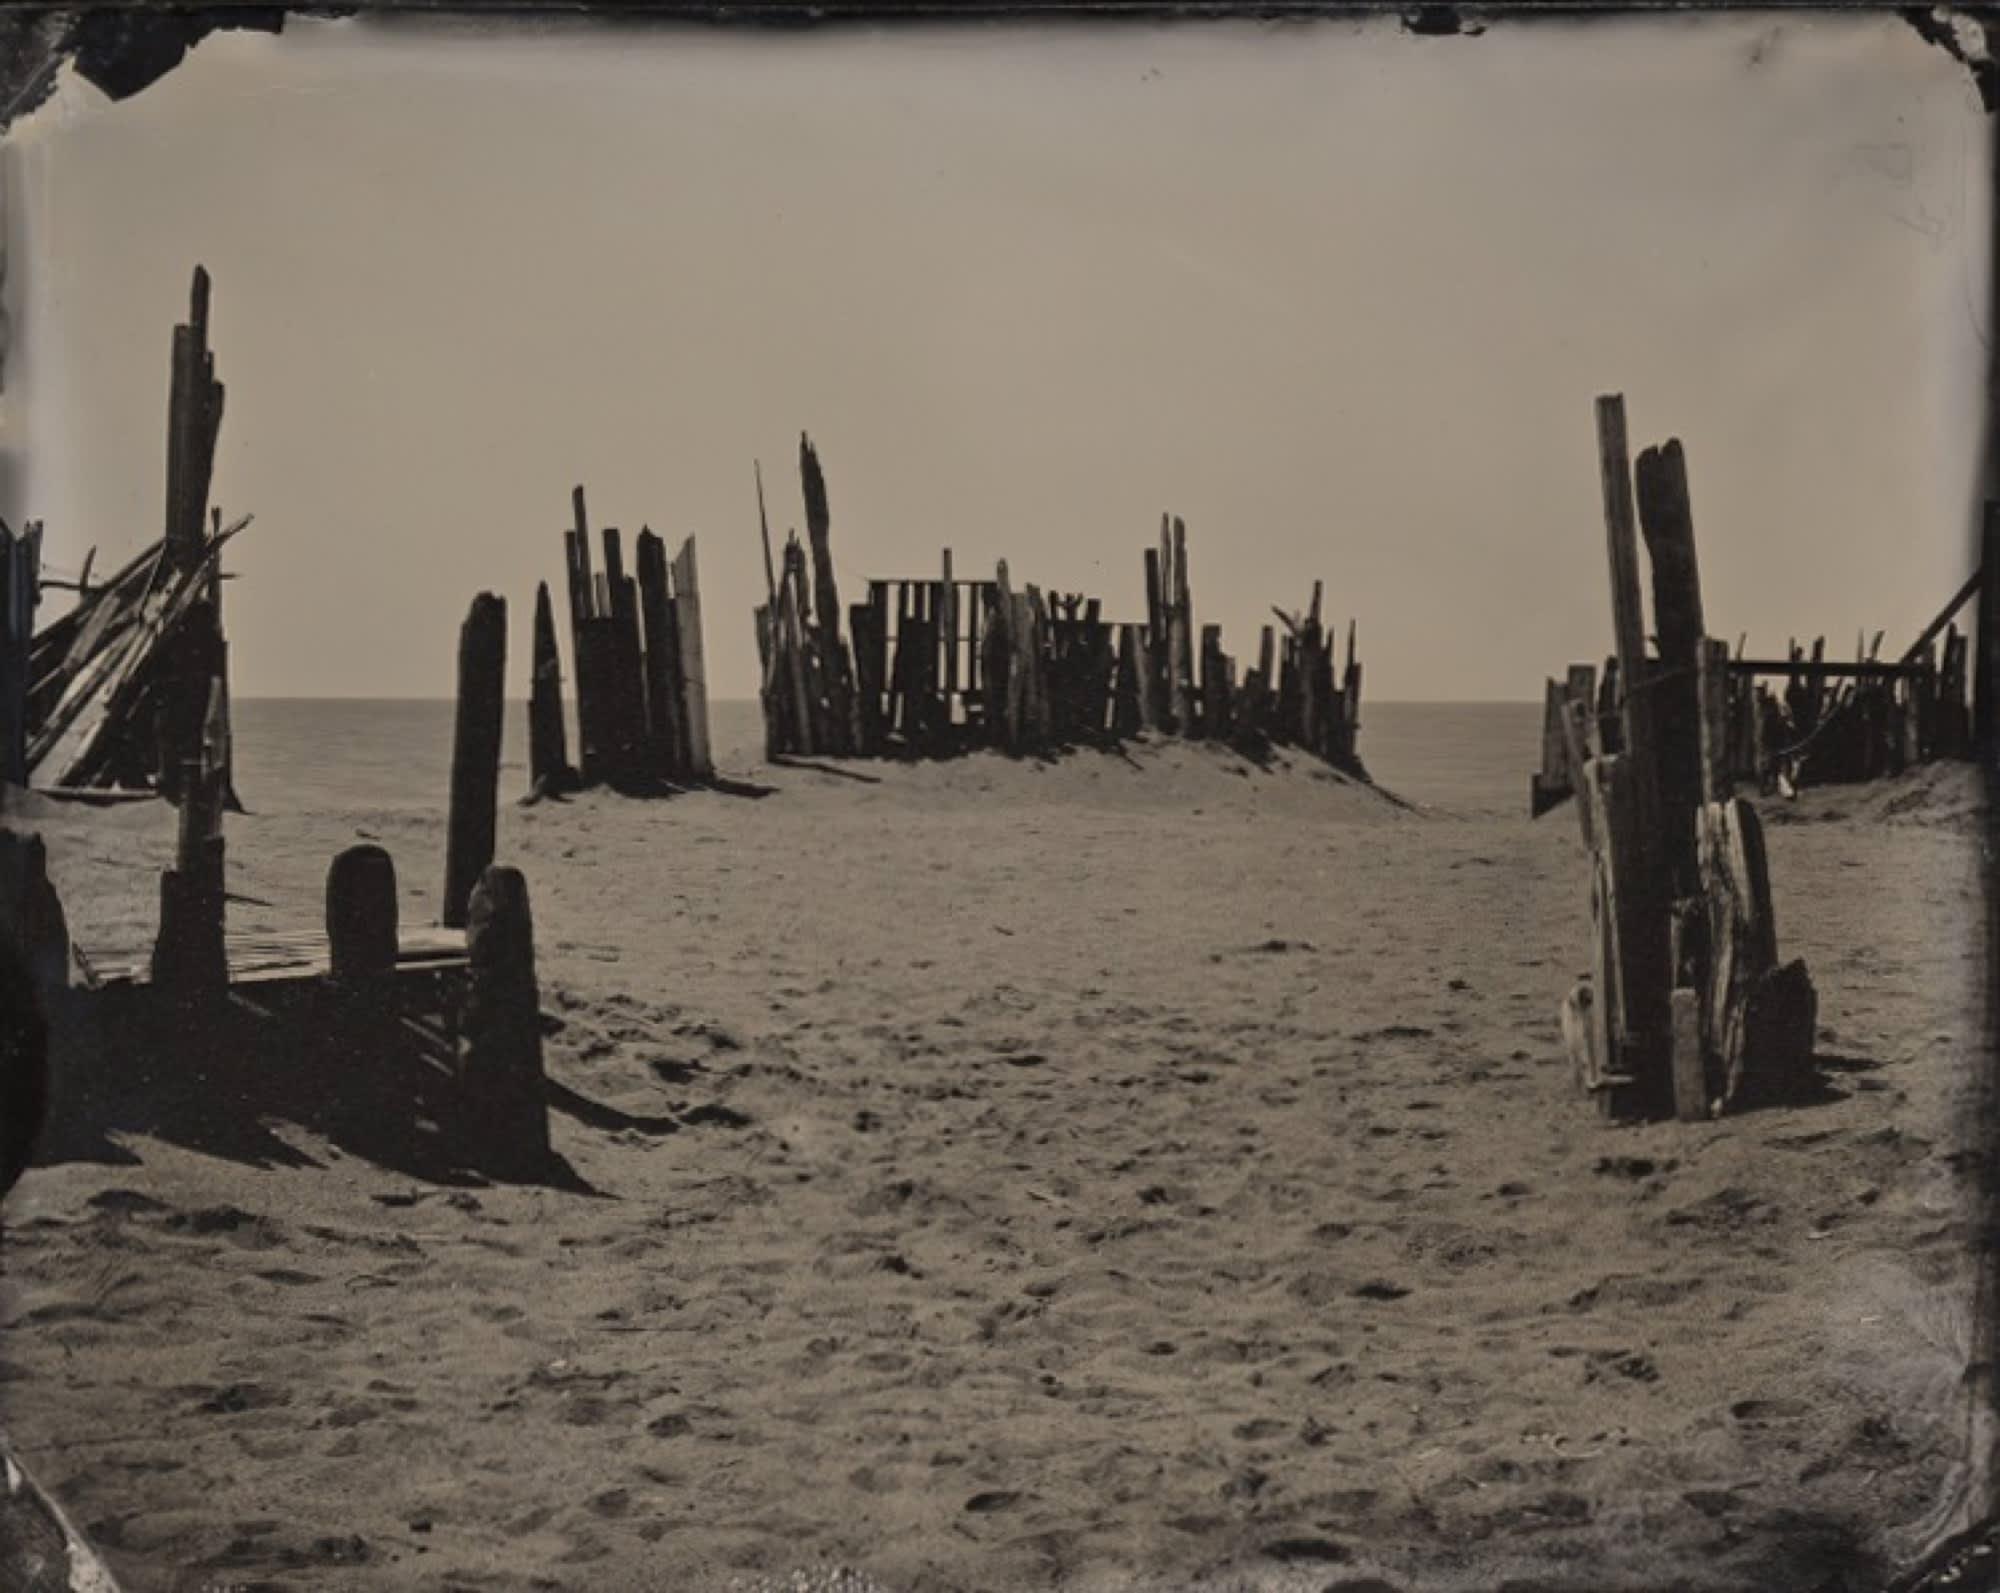 "<span class=""link fancybox-details-link""><a href=""/artists/32-joni-sternbach/works/325-joni-sternbach-04.05.20-8-beach-barrier-2004/"">View Detail Page</a></span><div class=""artist""><strong>Joni Sternbach</strong></div> <div class=""title""><em>04.05.20 #8 Beach Barrier</em>, 2004</div> <div class=""medium"">Ambrotype<br /> Unique</div> <div class=""dimensions"">10.2 x 12.7 cm<br /> 4 x 5 in</div><div class=""copyright_line"">Copyright Joni Sternbach</div>"